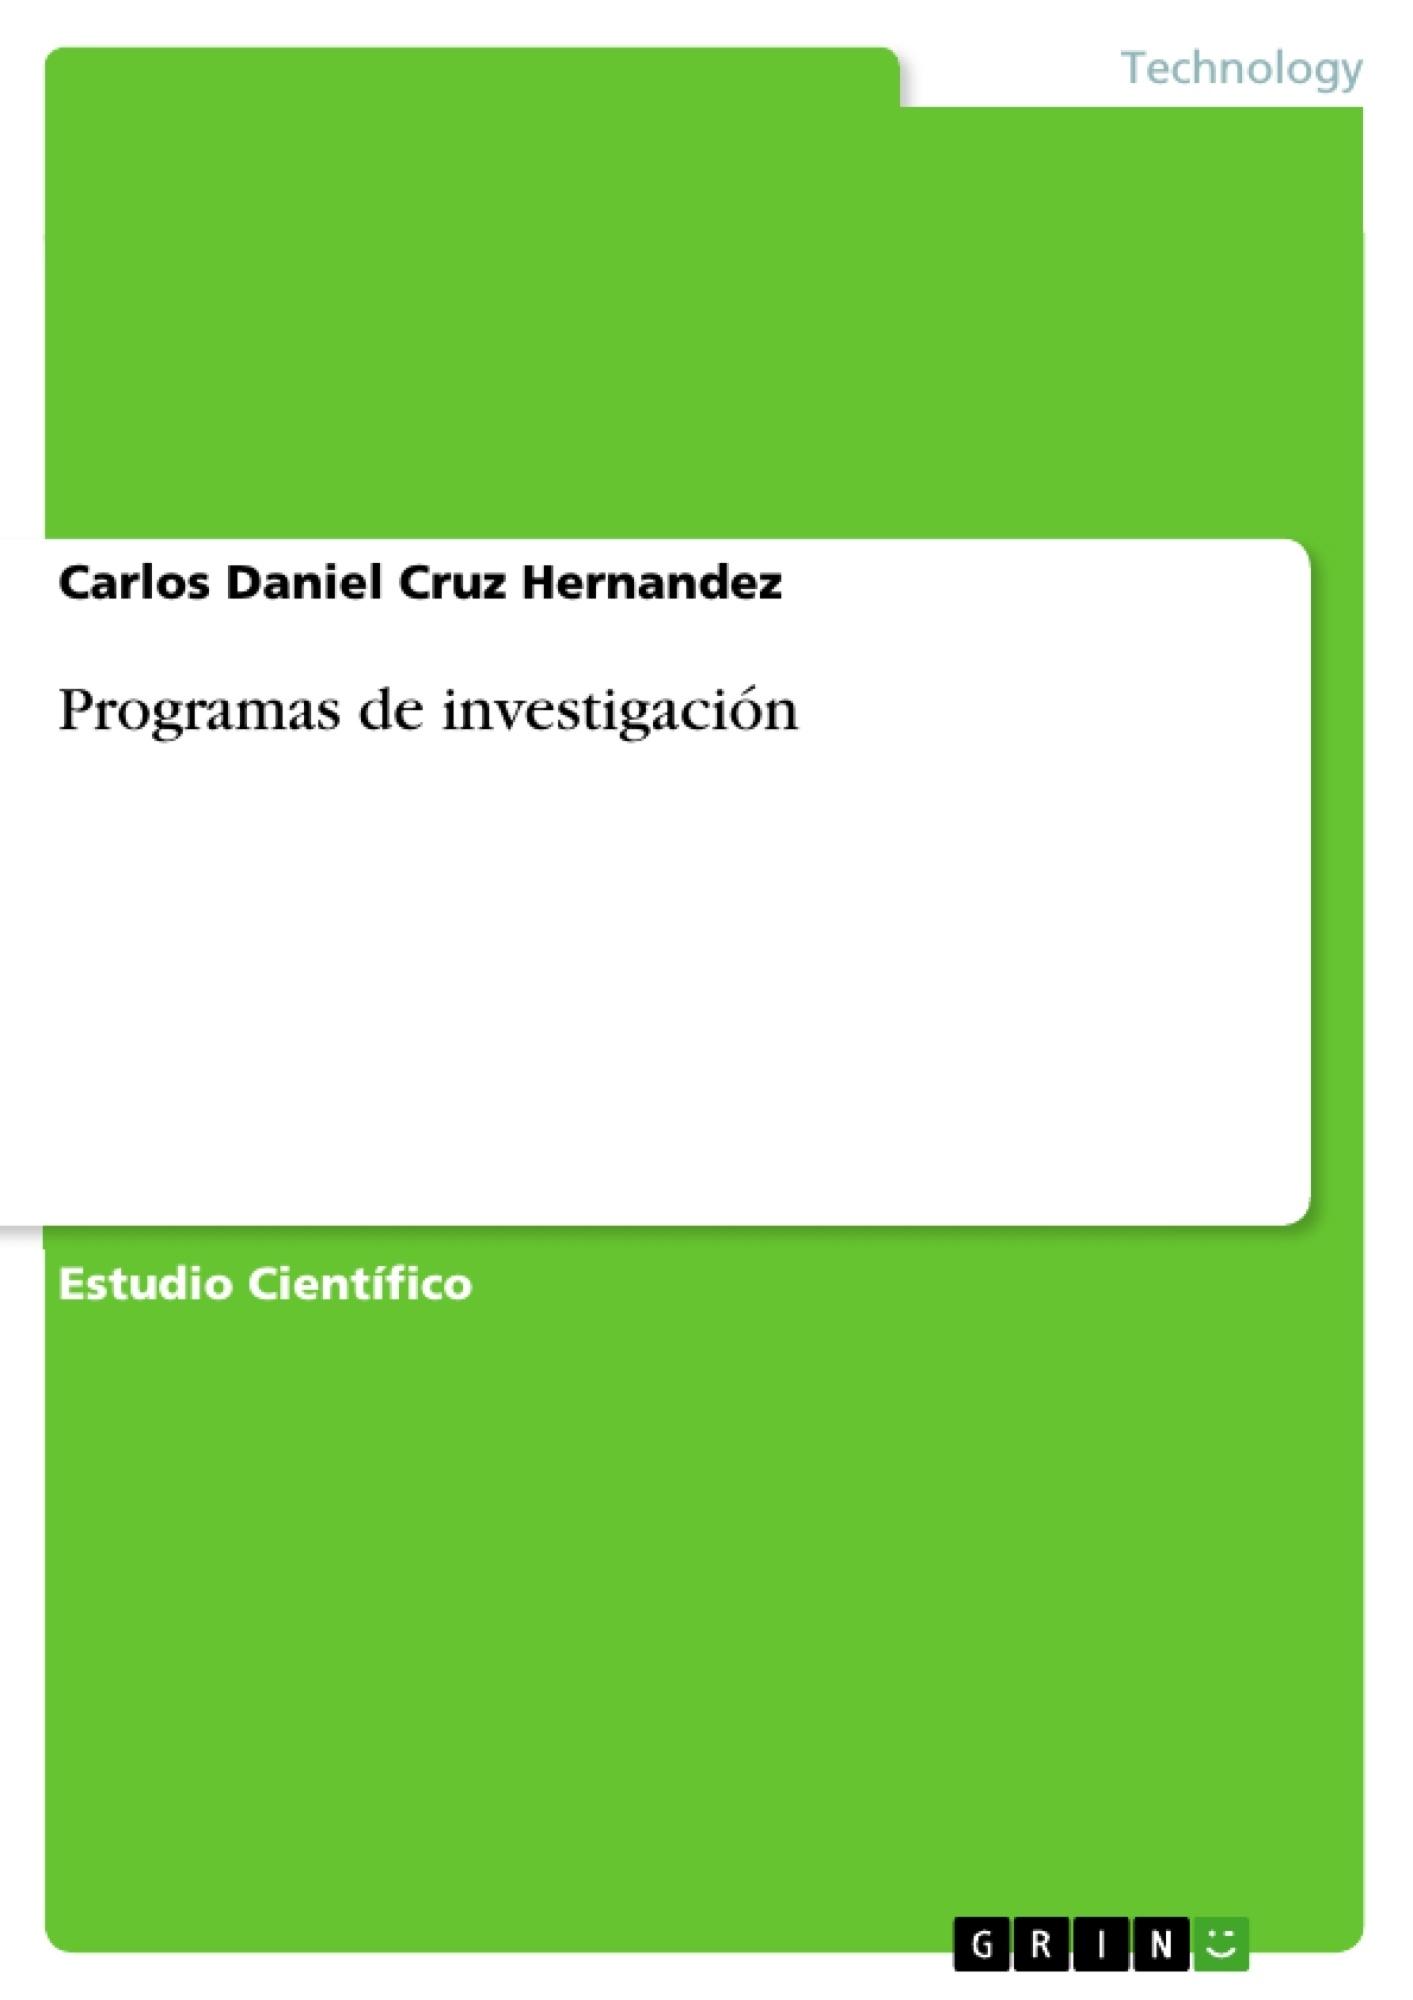 Título: Programas de investigación